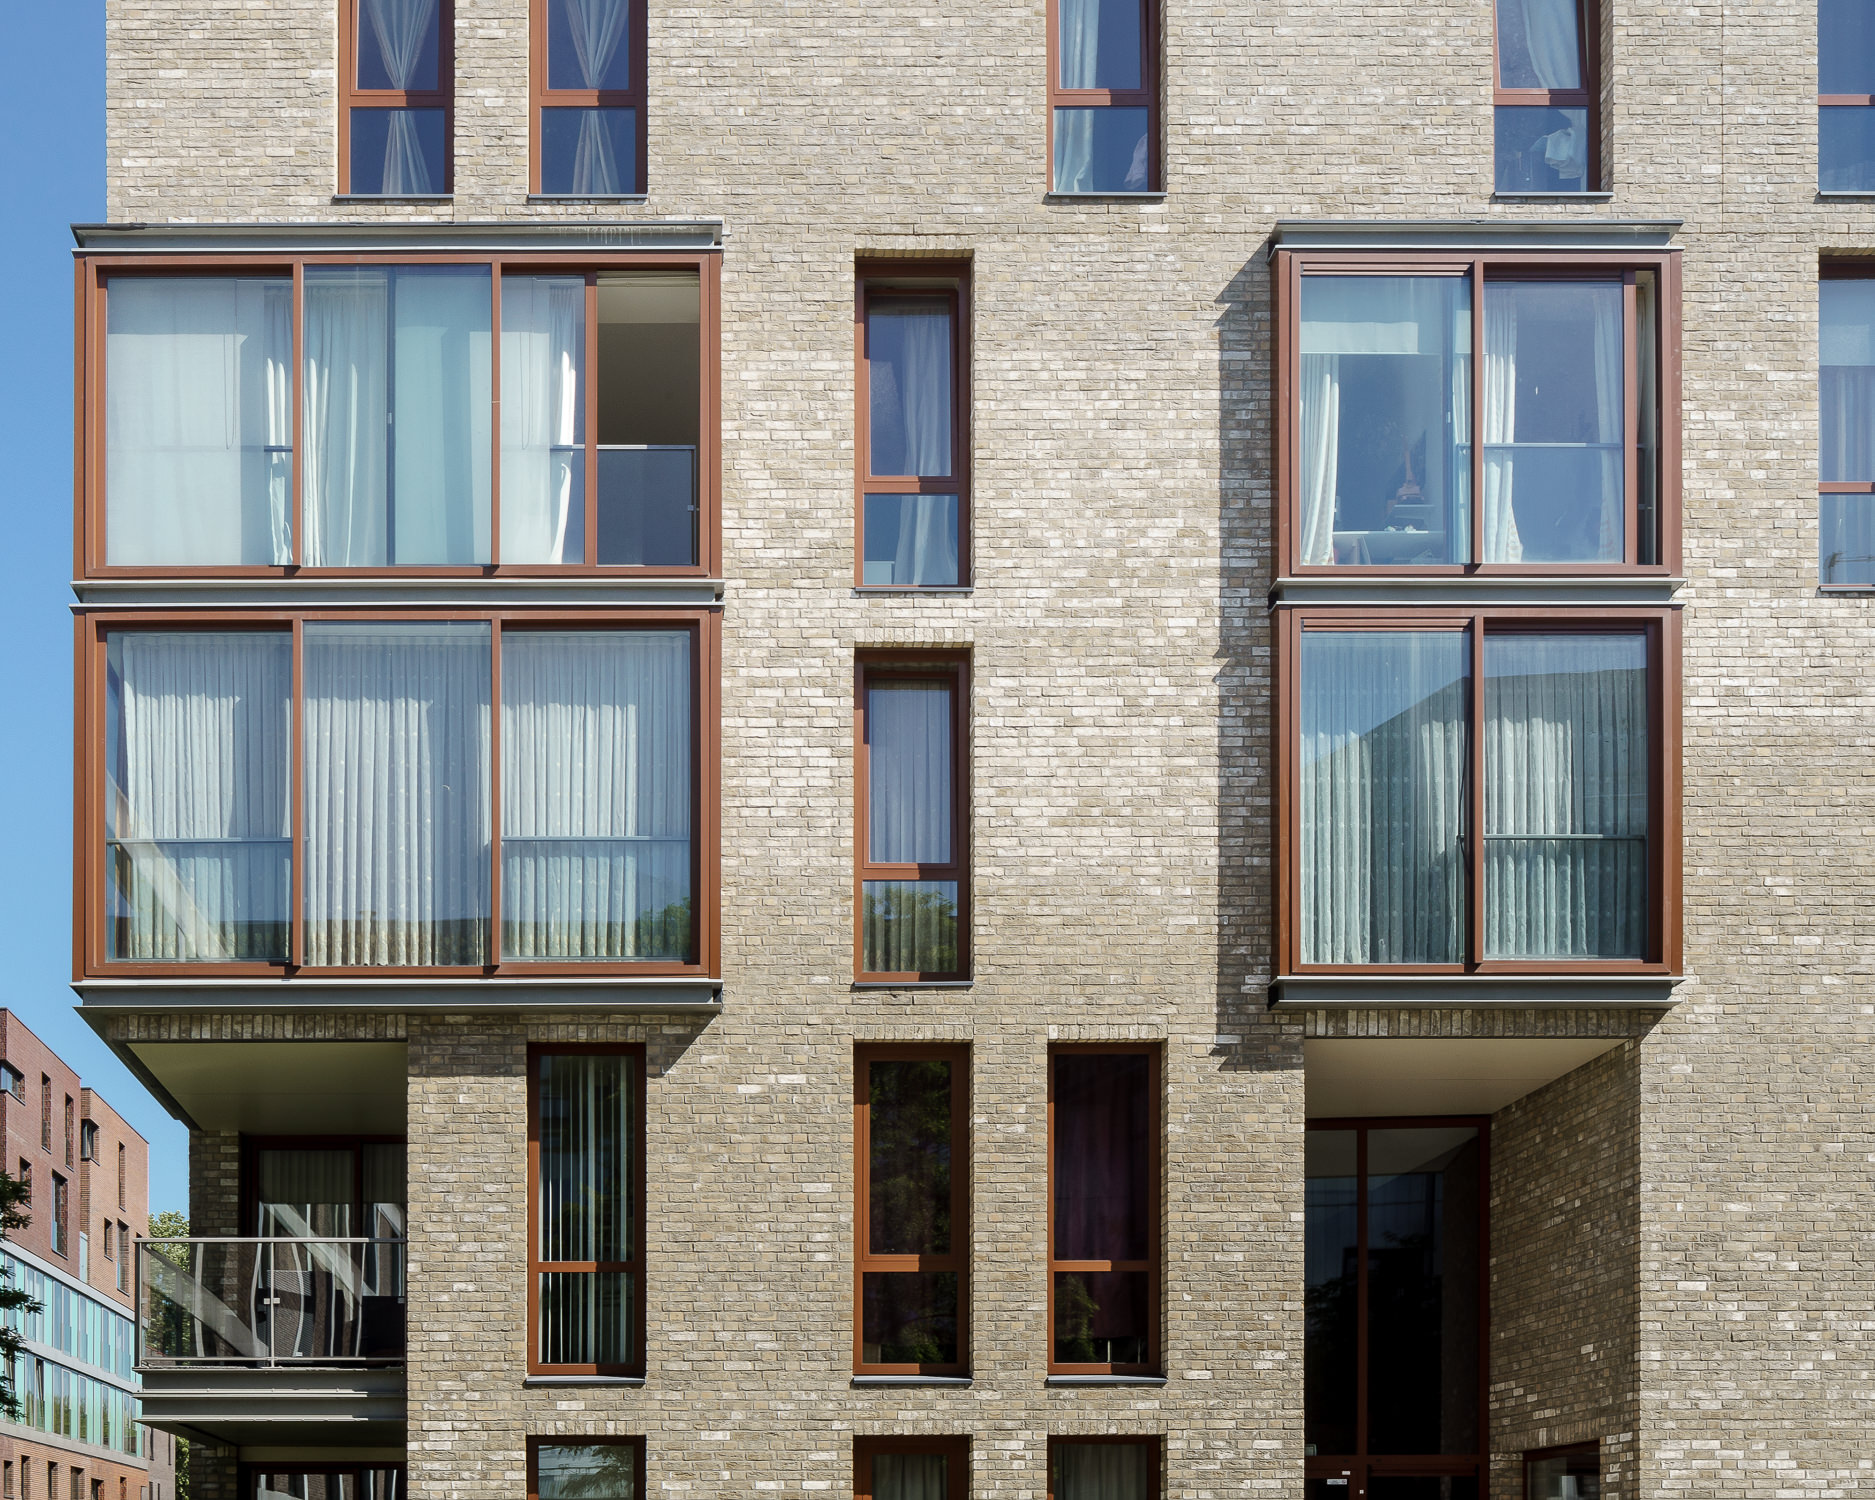 amsterdam-modern-architecture-facade-het-funen-mark-hadden-photography-architectuurfotograaf--3.jpg